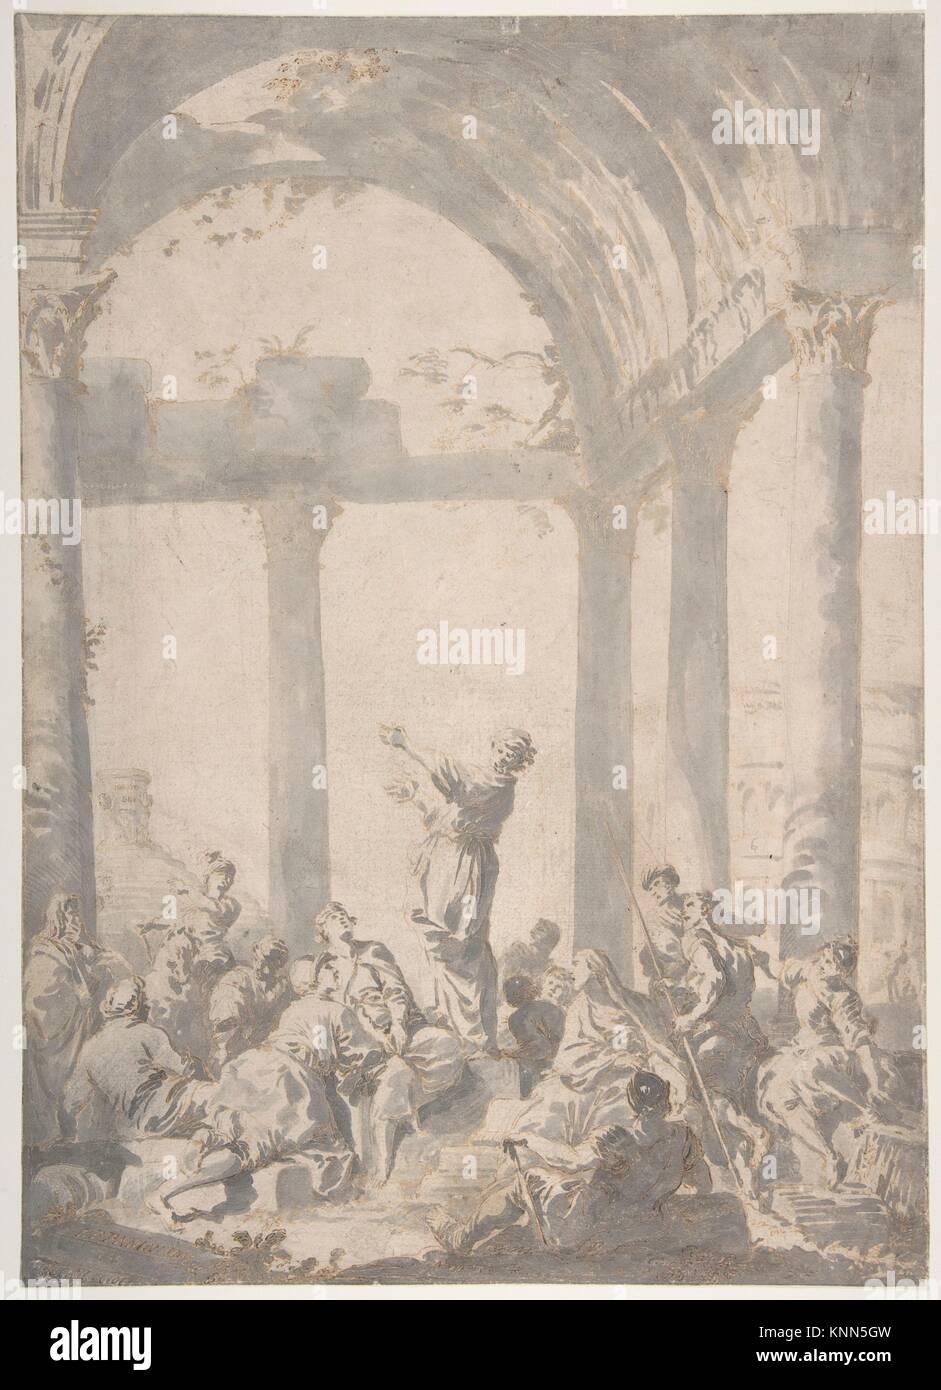 Saint Paul Preaching in Athens. Artist: Giovanni Paolo Panini (Italian, Piacenza 1691-1765 Rome); Date: 1733; Medium: - Stock Image